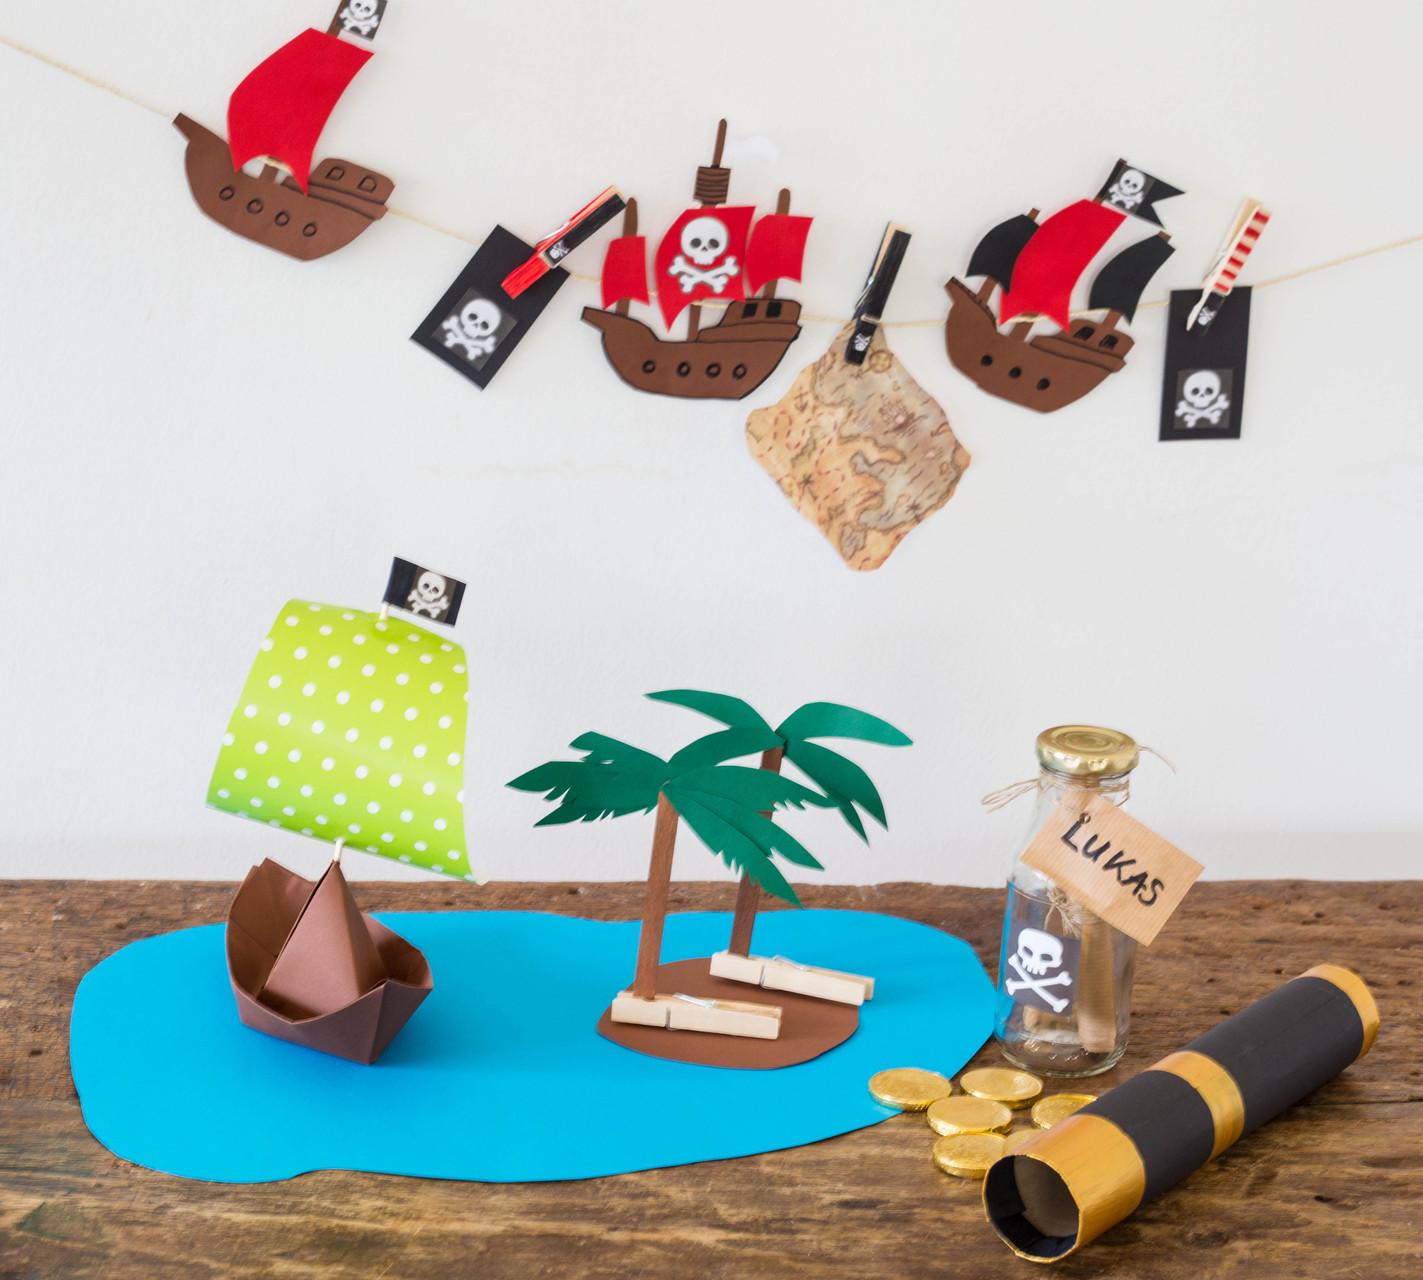 piratenparty ideen f r bunte kindergeburtstage. Black Bedroom Furniture Sets. Home Design Ideas